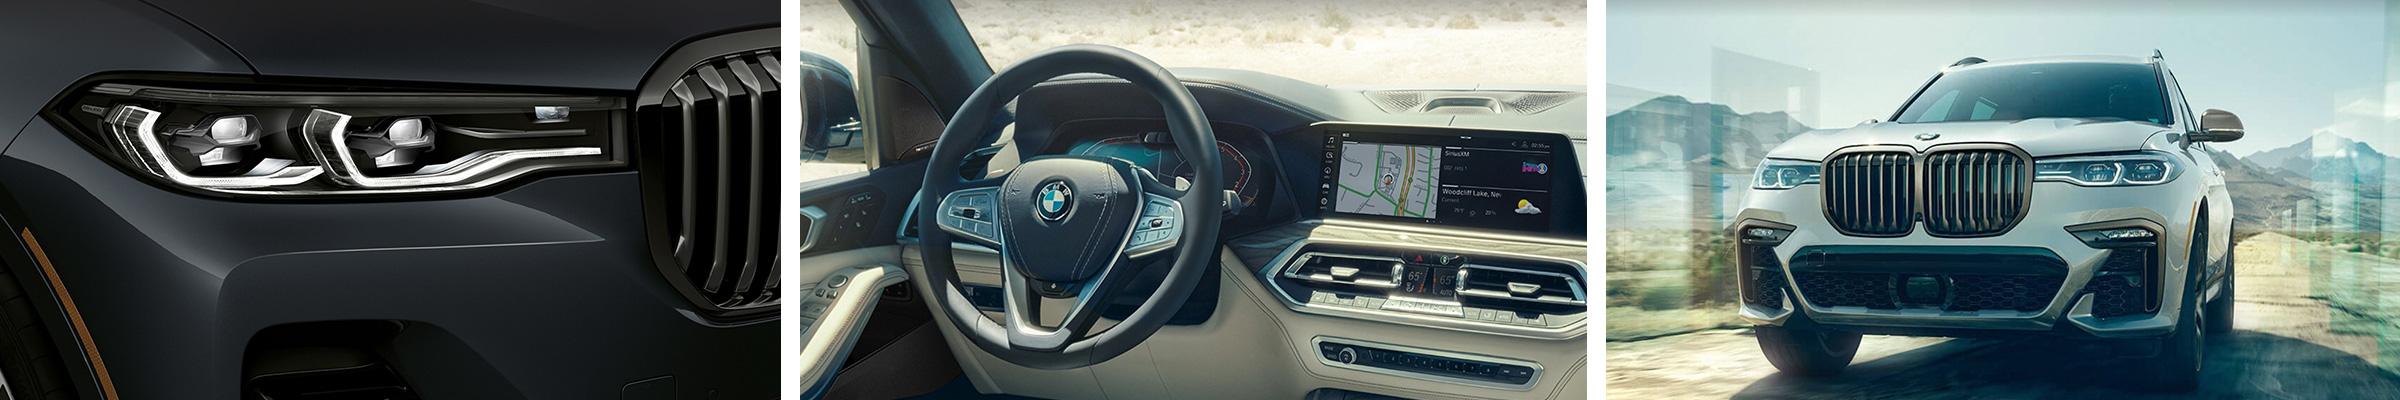 2021 BMW X7 For Sale Wilmington NC   Leland